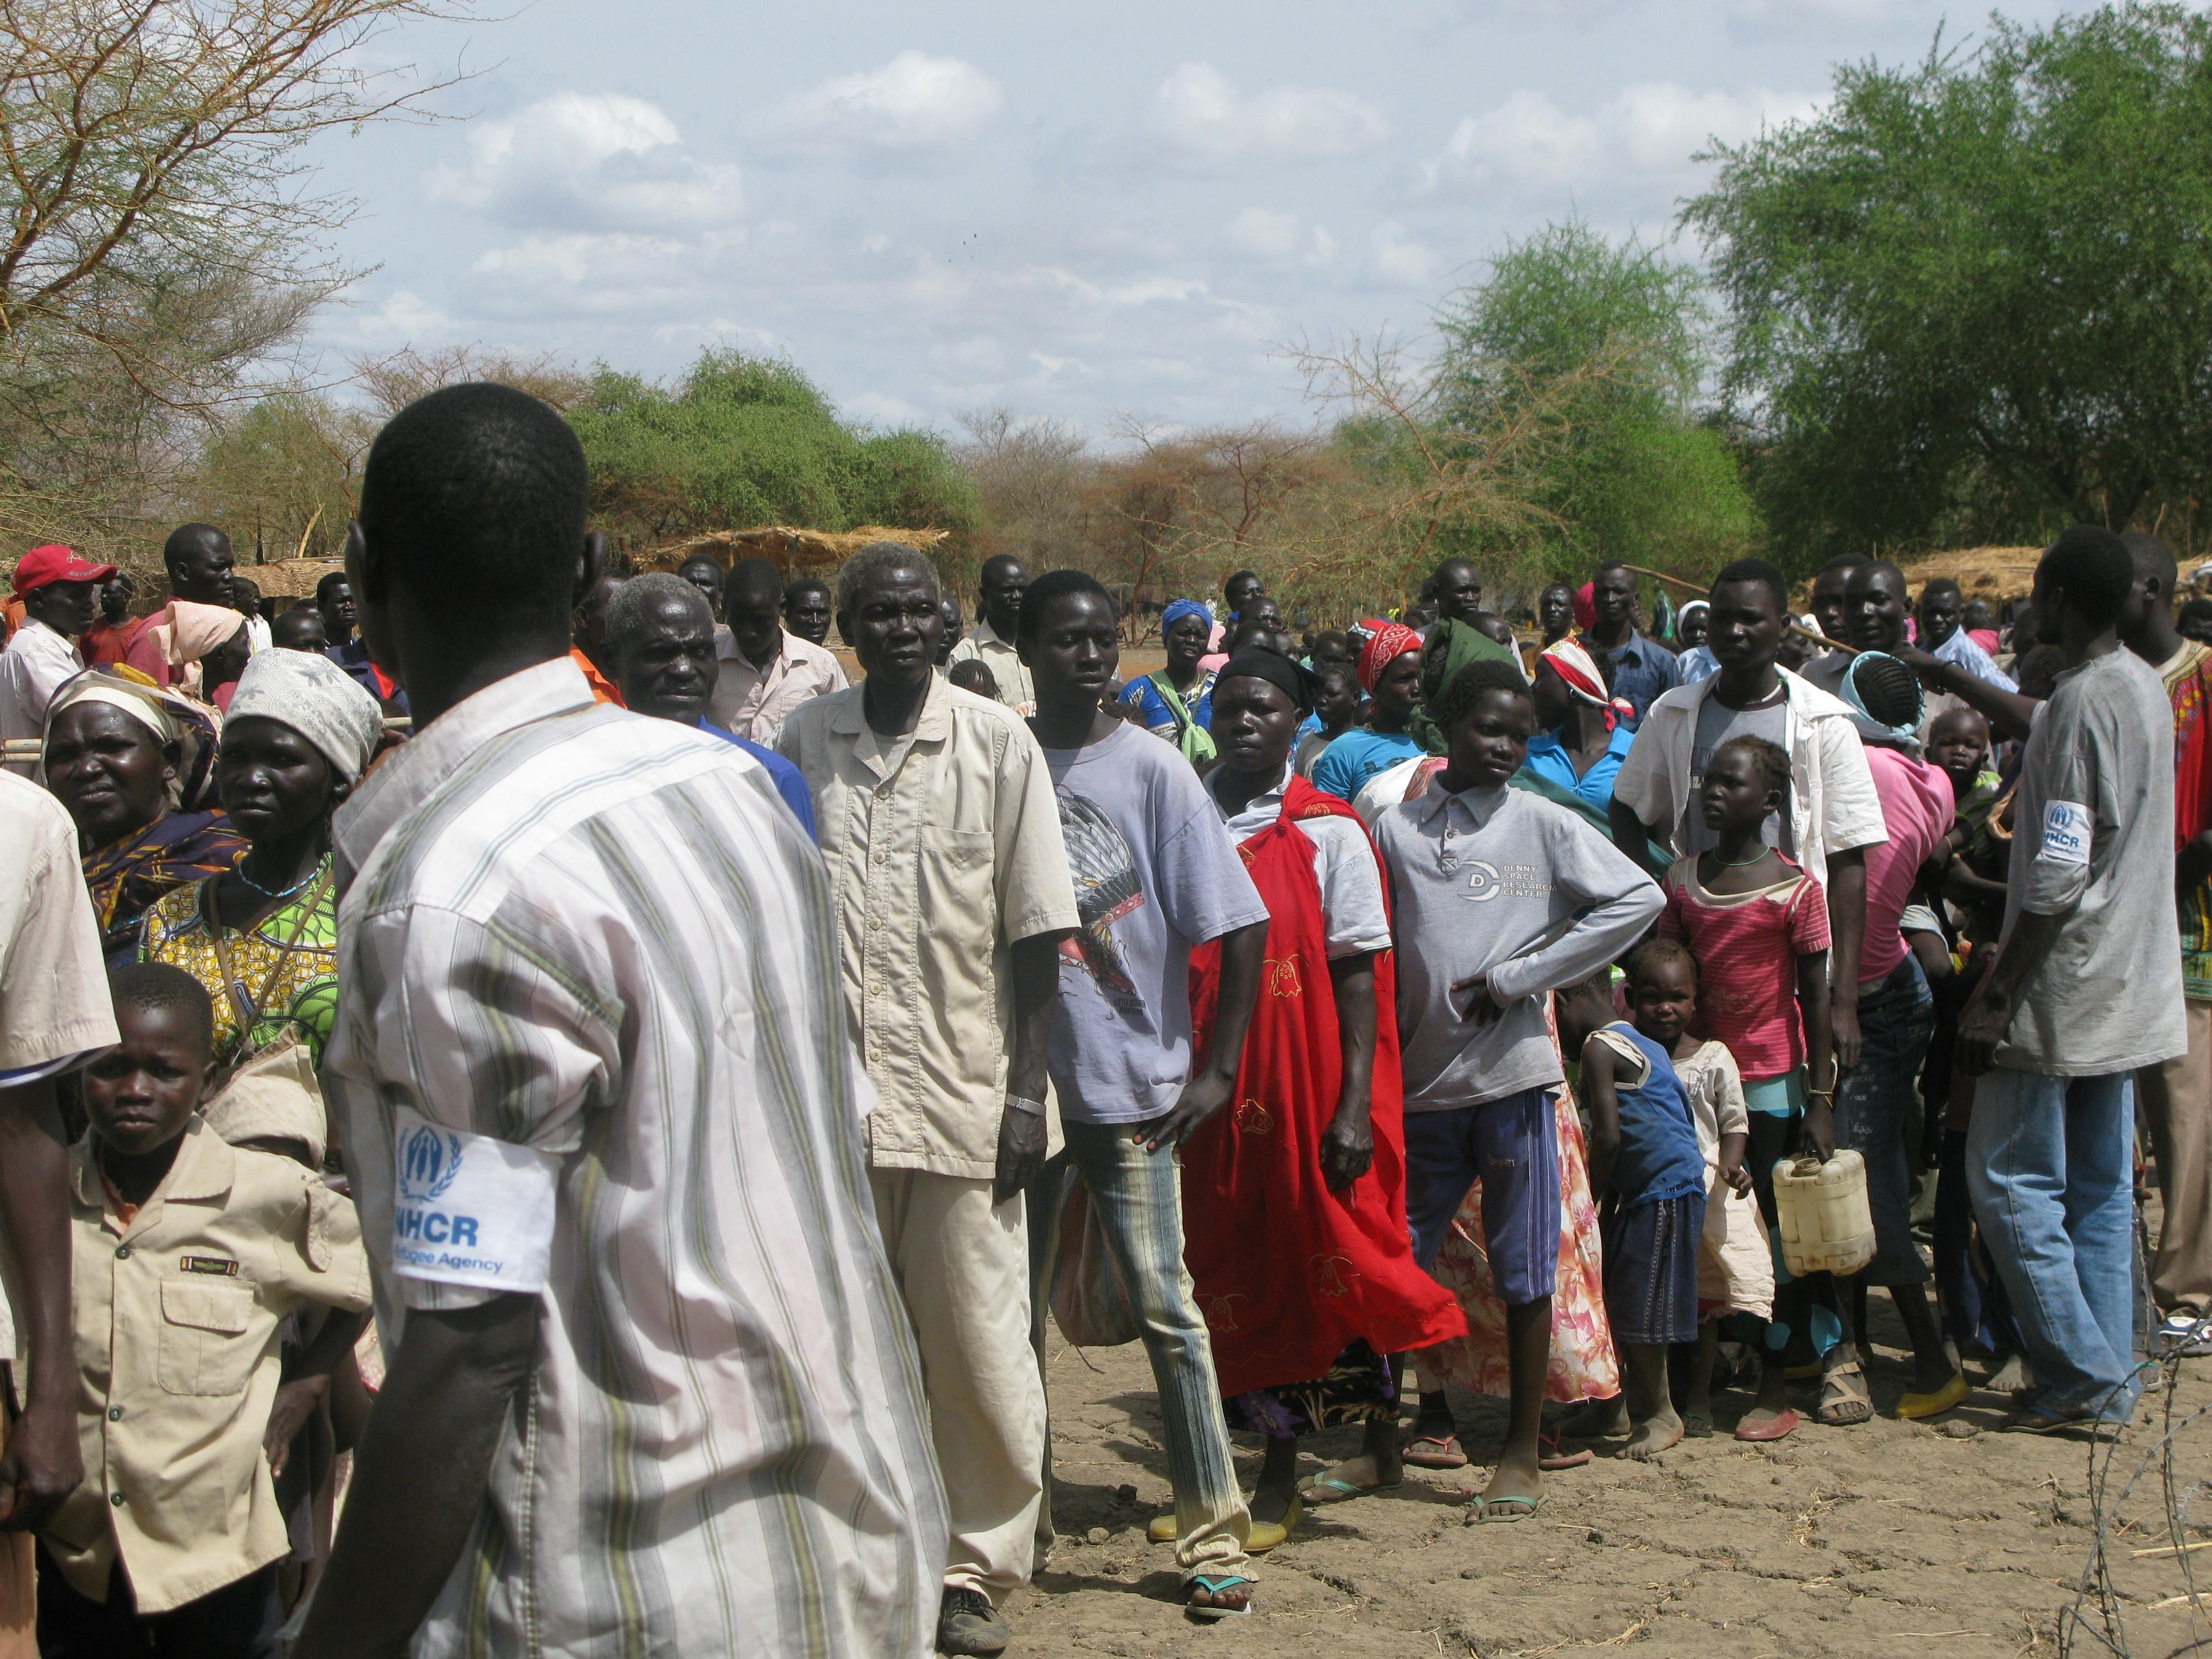 Bildergebnis für südsudan